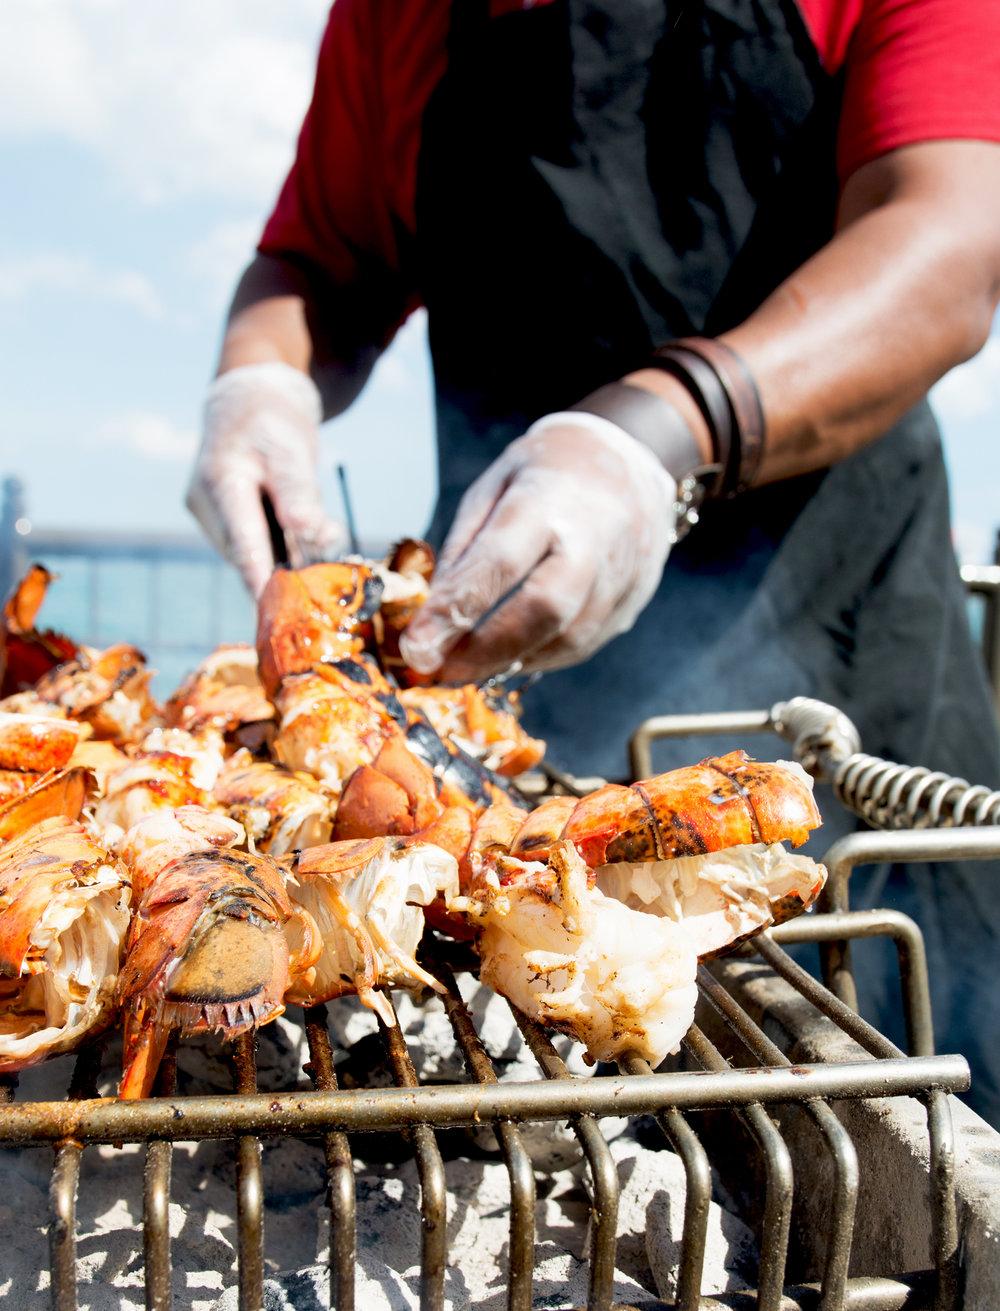 LobsterFest_Chicaho2018_image52.jpg